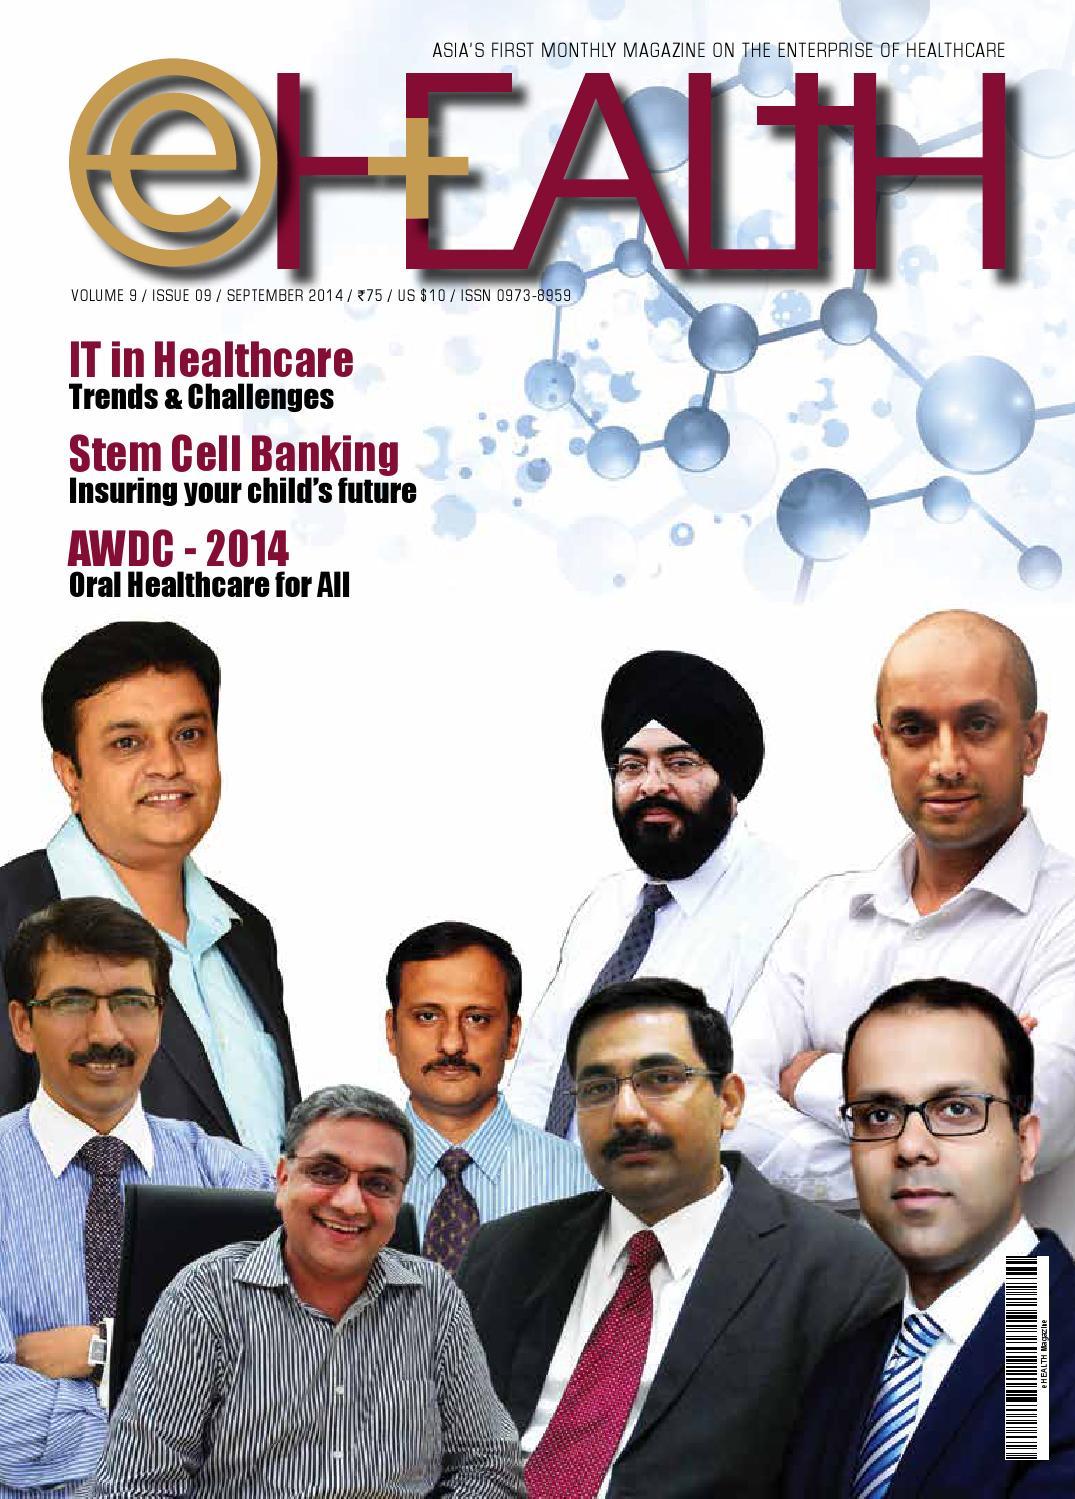 eHEALTH - September - 2014 by eHealth Magazine - Elets Technomedia